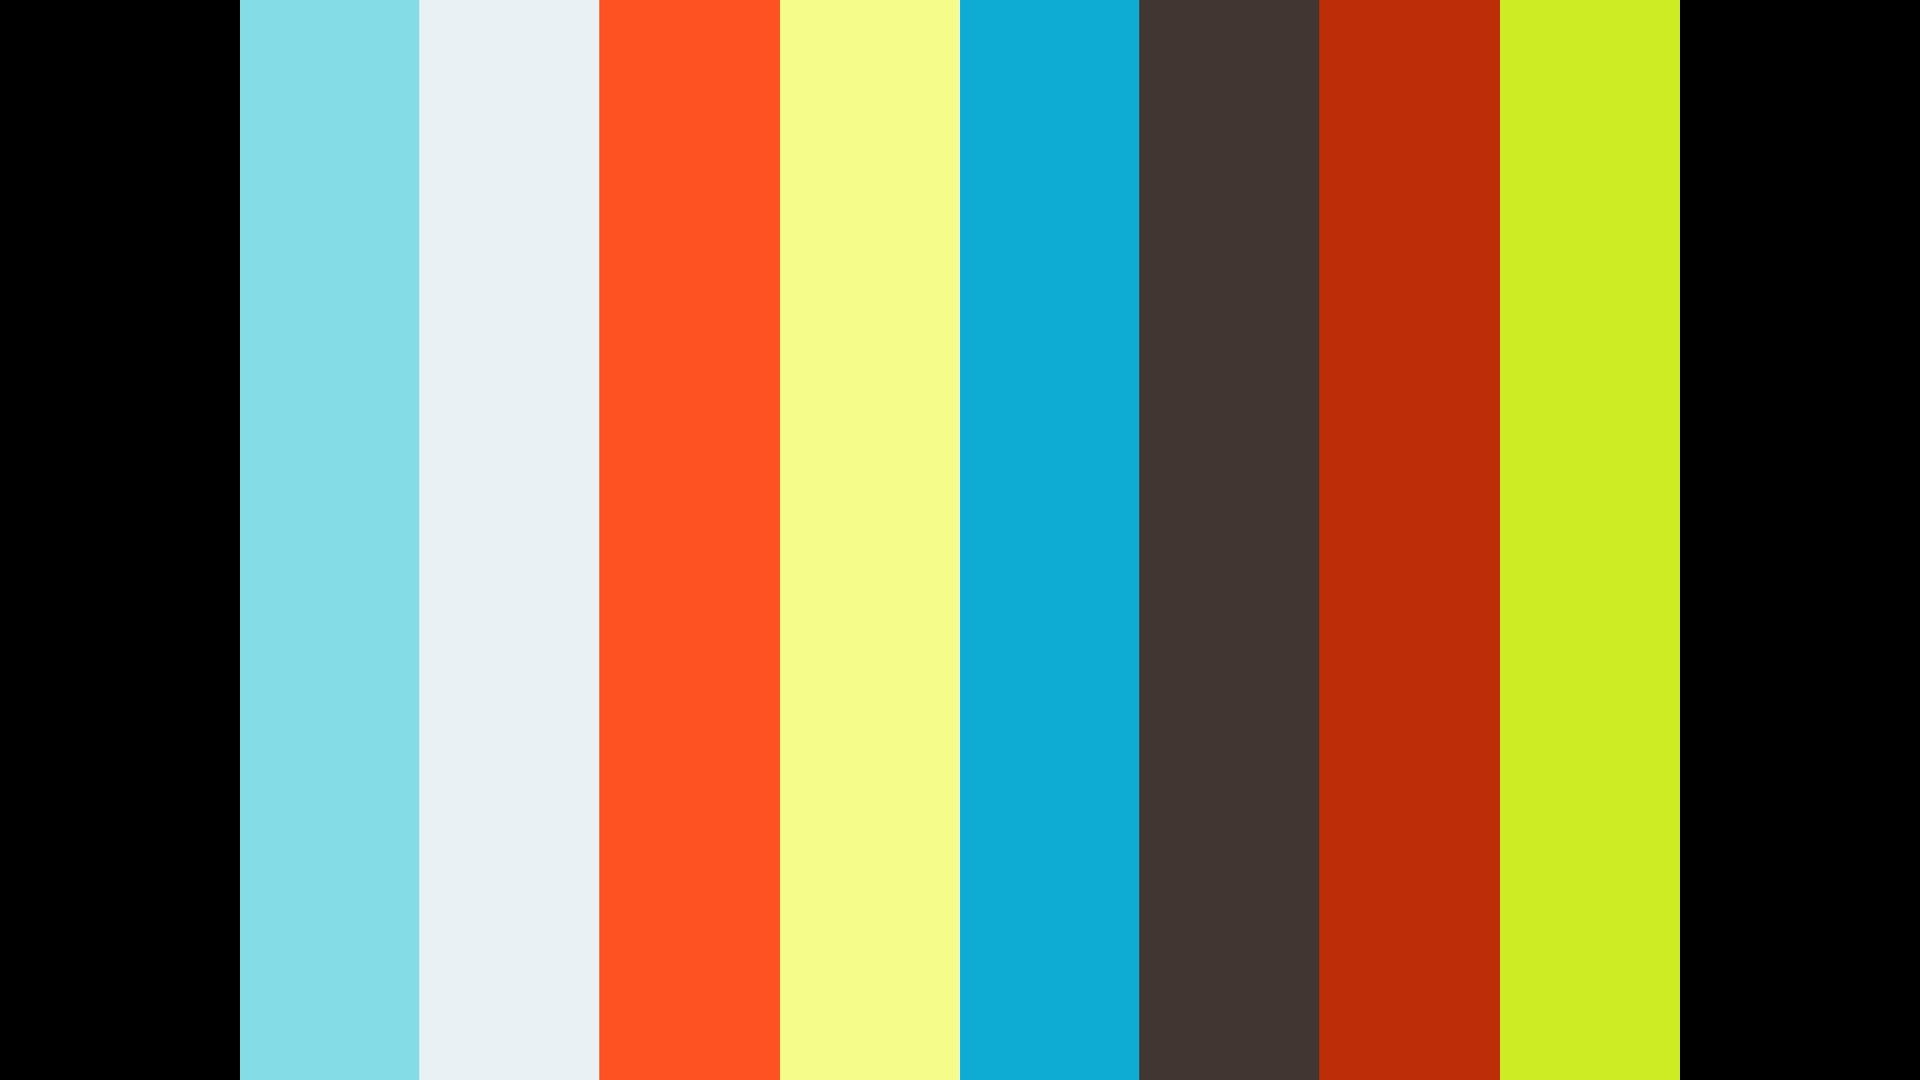 #NFTYSARFALL 2017